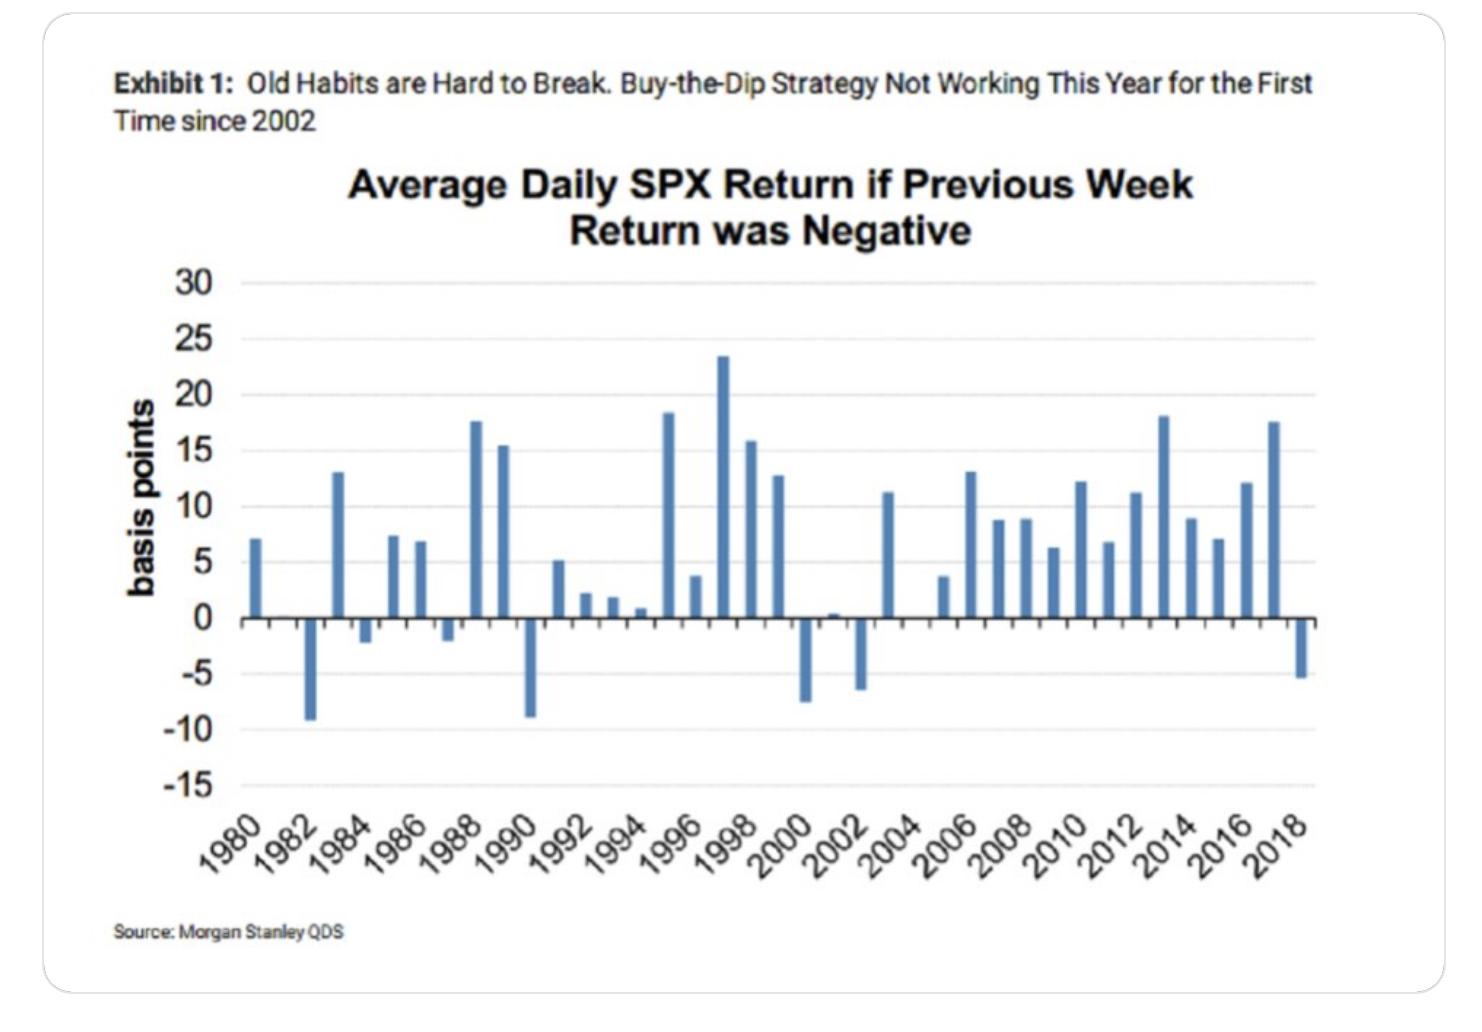 Average Daily SPX